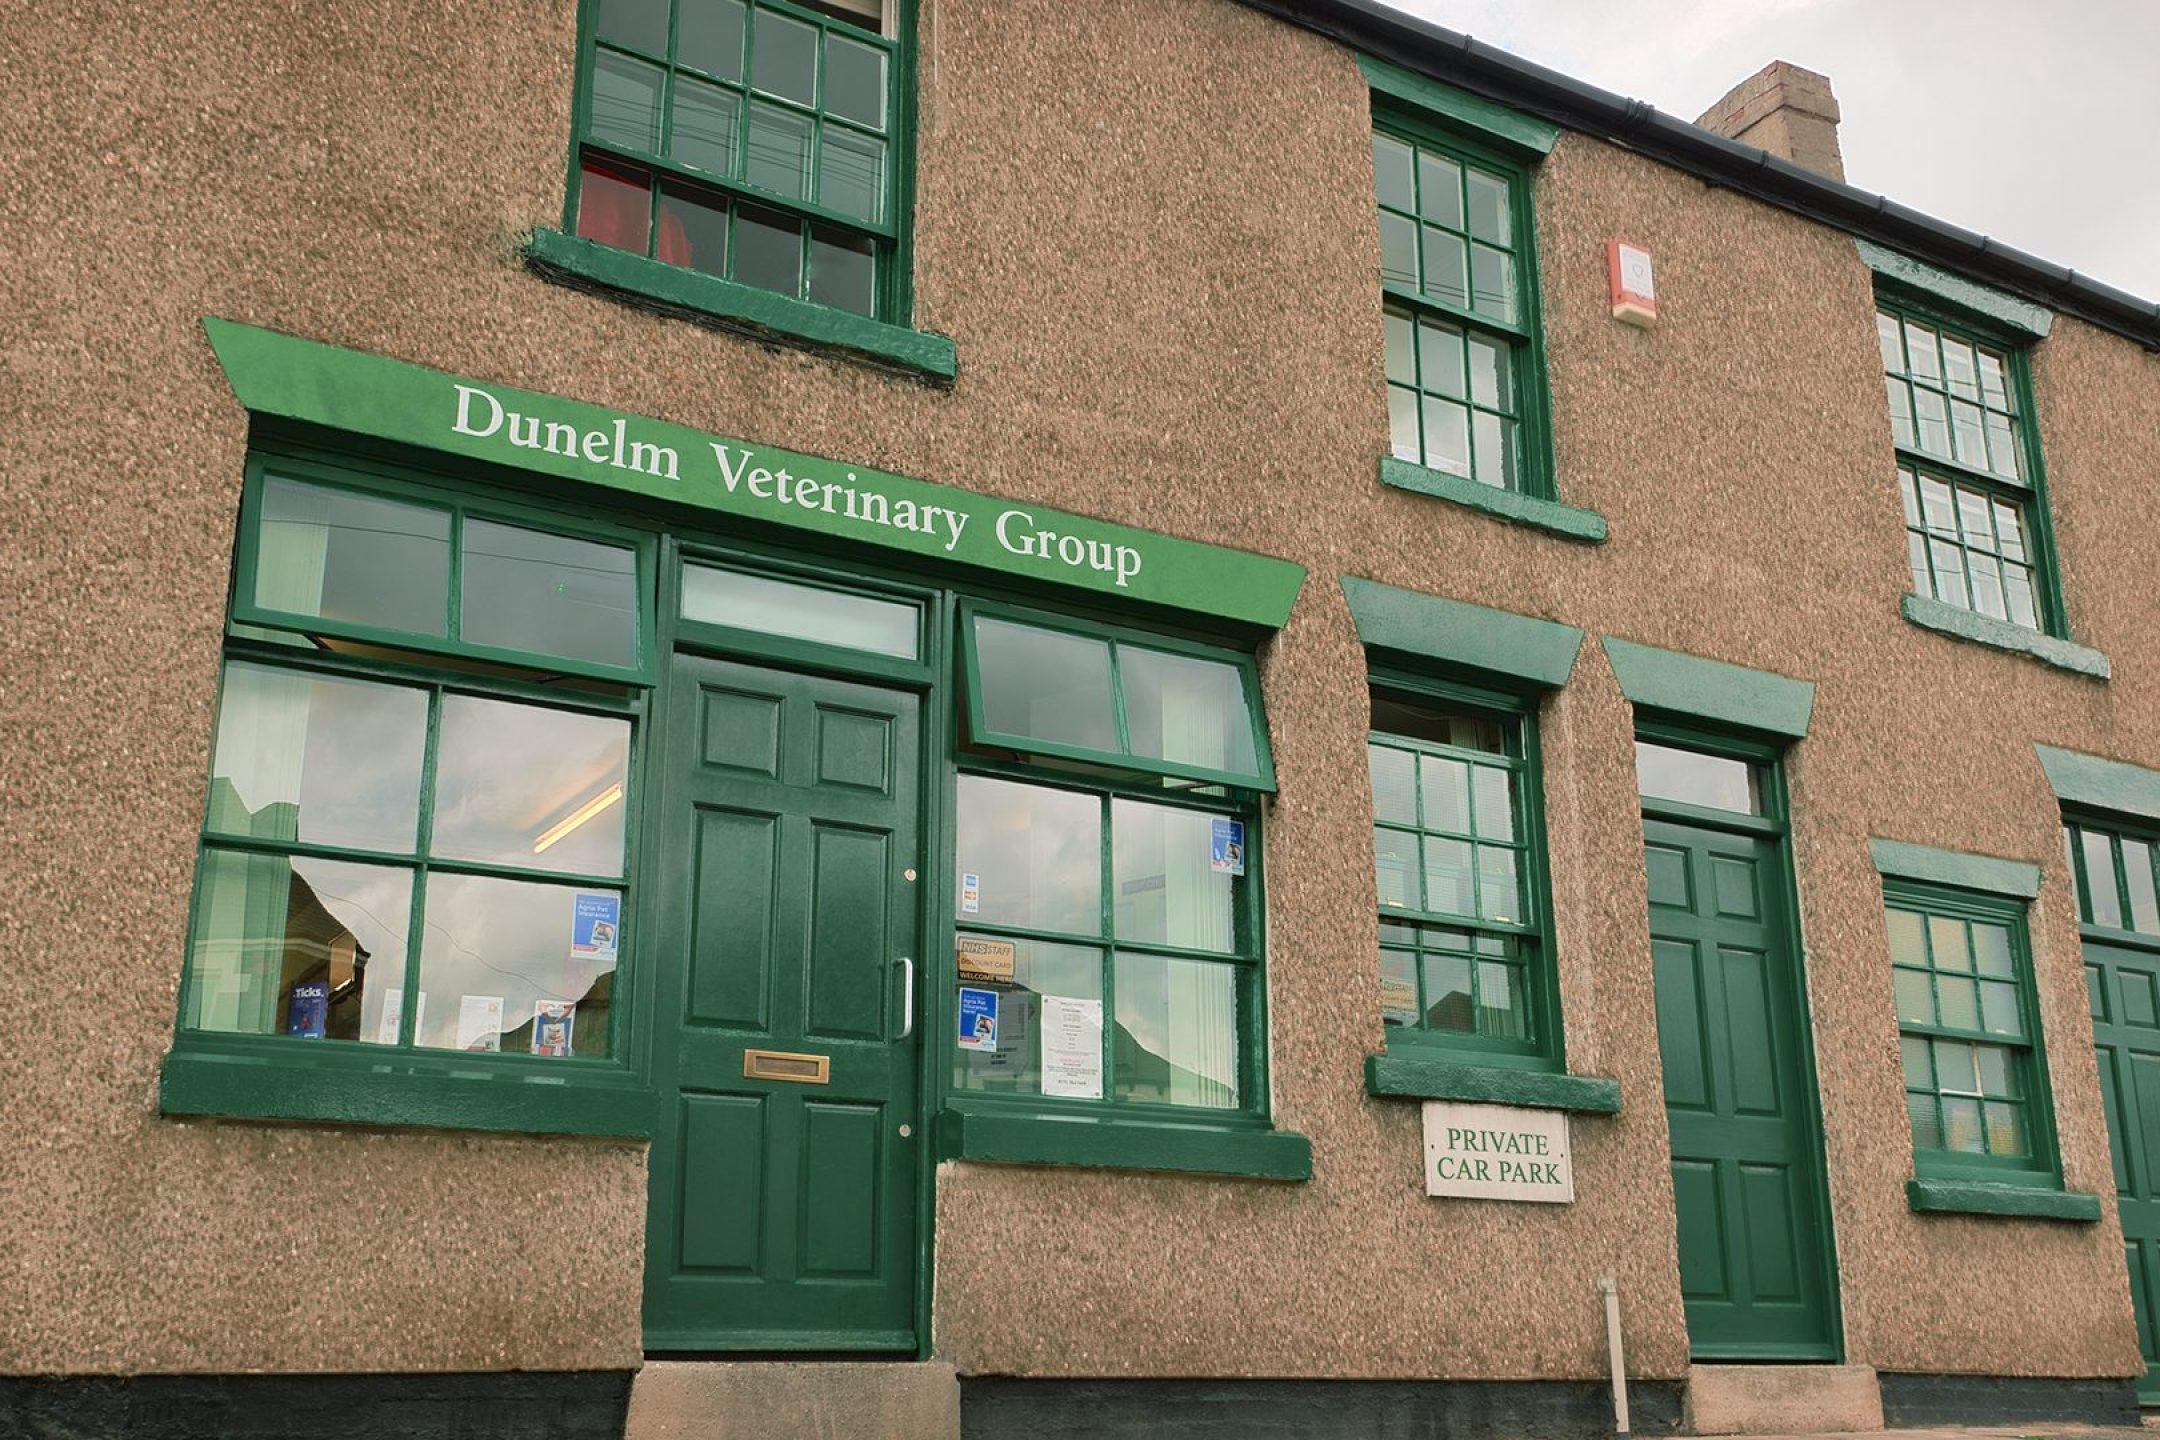 Duenelm Veterinary Group Premises